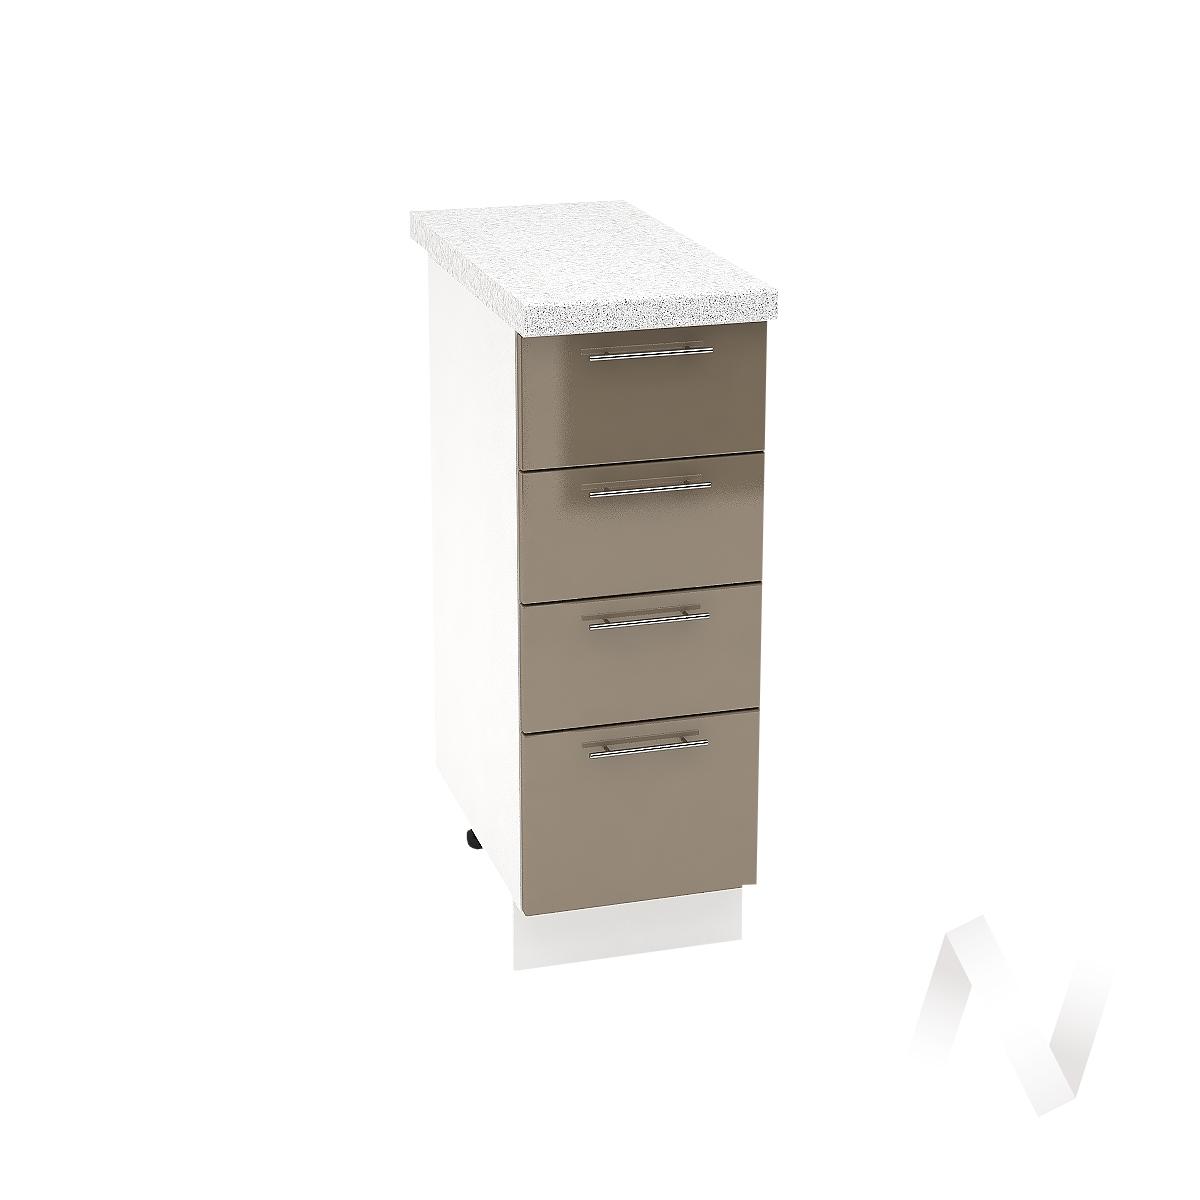 "Кухня ""Валерия-М"": Шкаф нижний с 4-мя ящиками 300, ШН4Я 300 (Капучино глянец/корпус белый)"